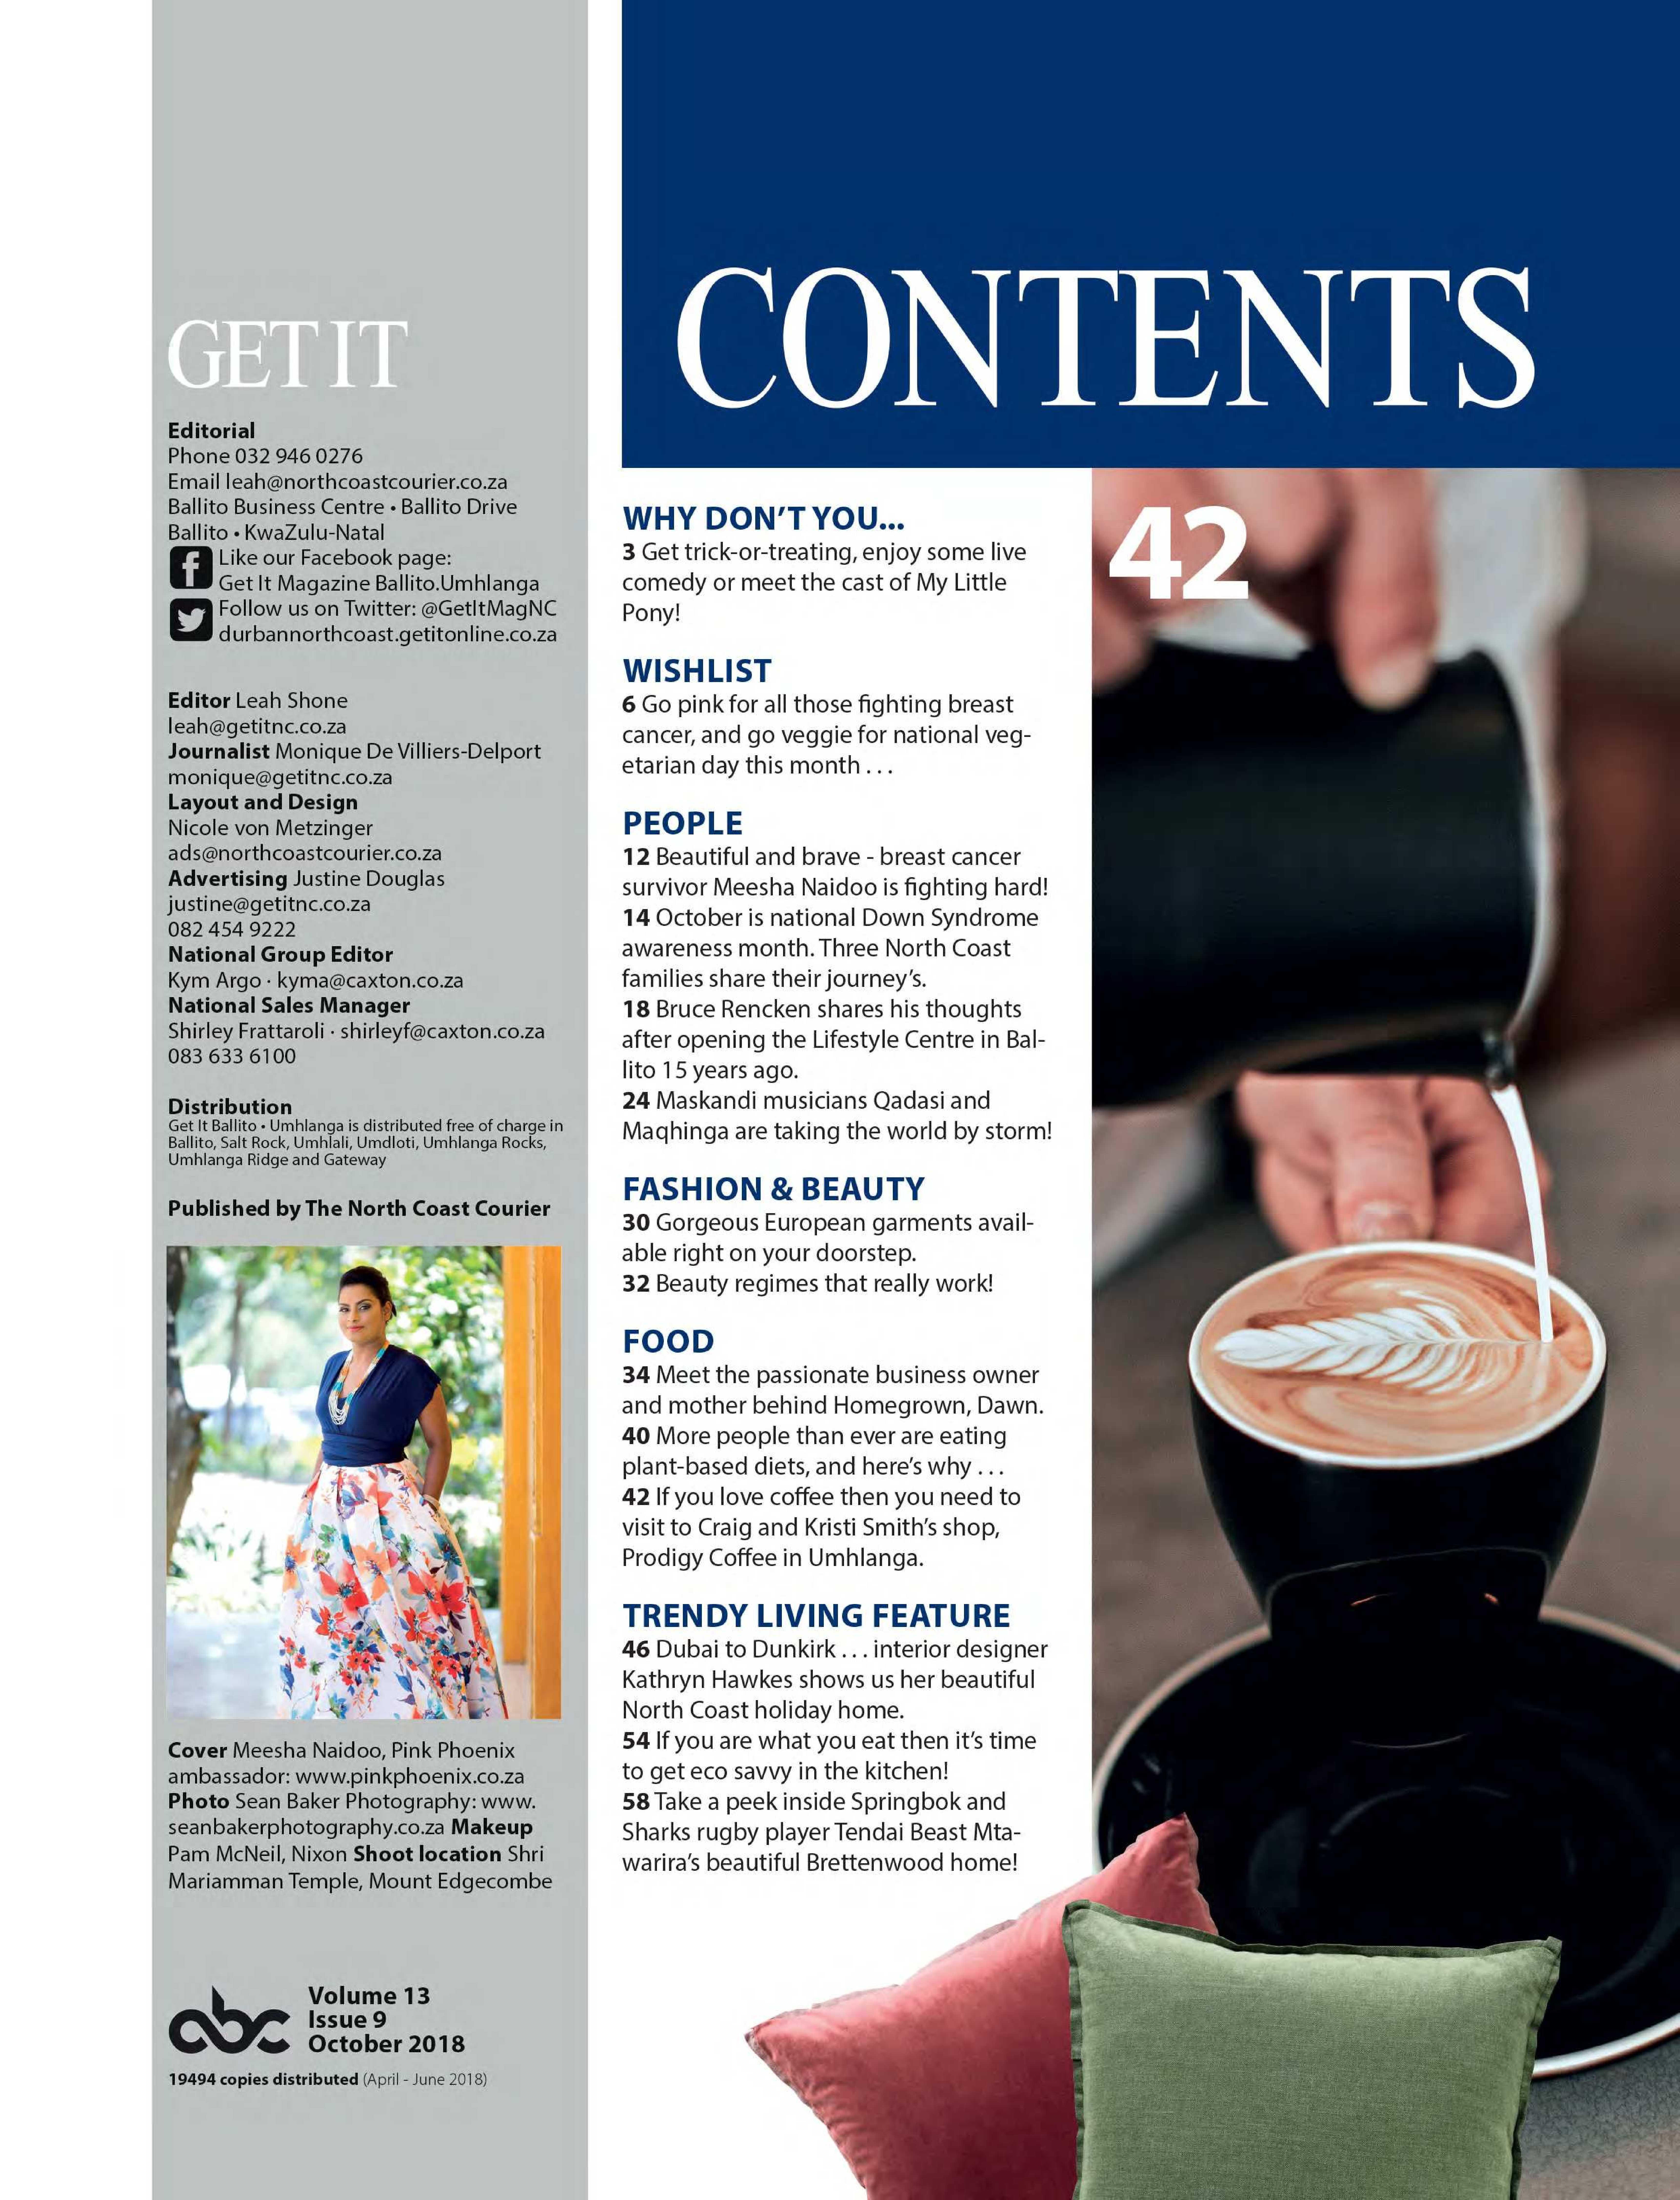 get-magazine-ballitoumhlanga-october-2018-epapers-page-3